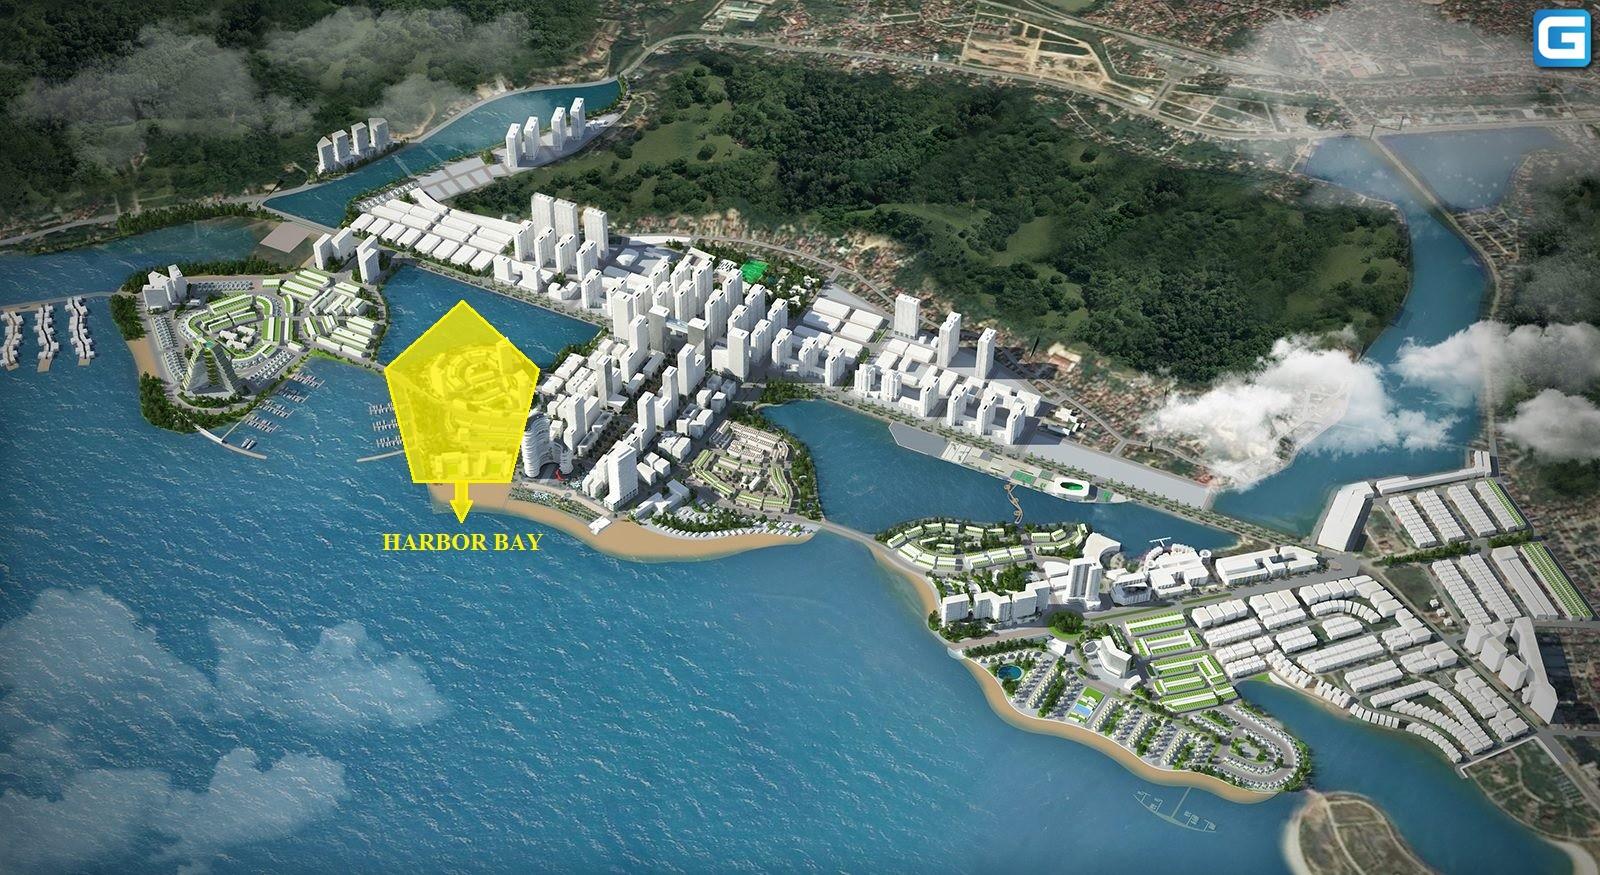 Harbor Bay Hạ Long